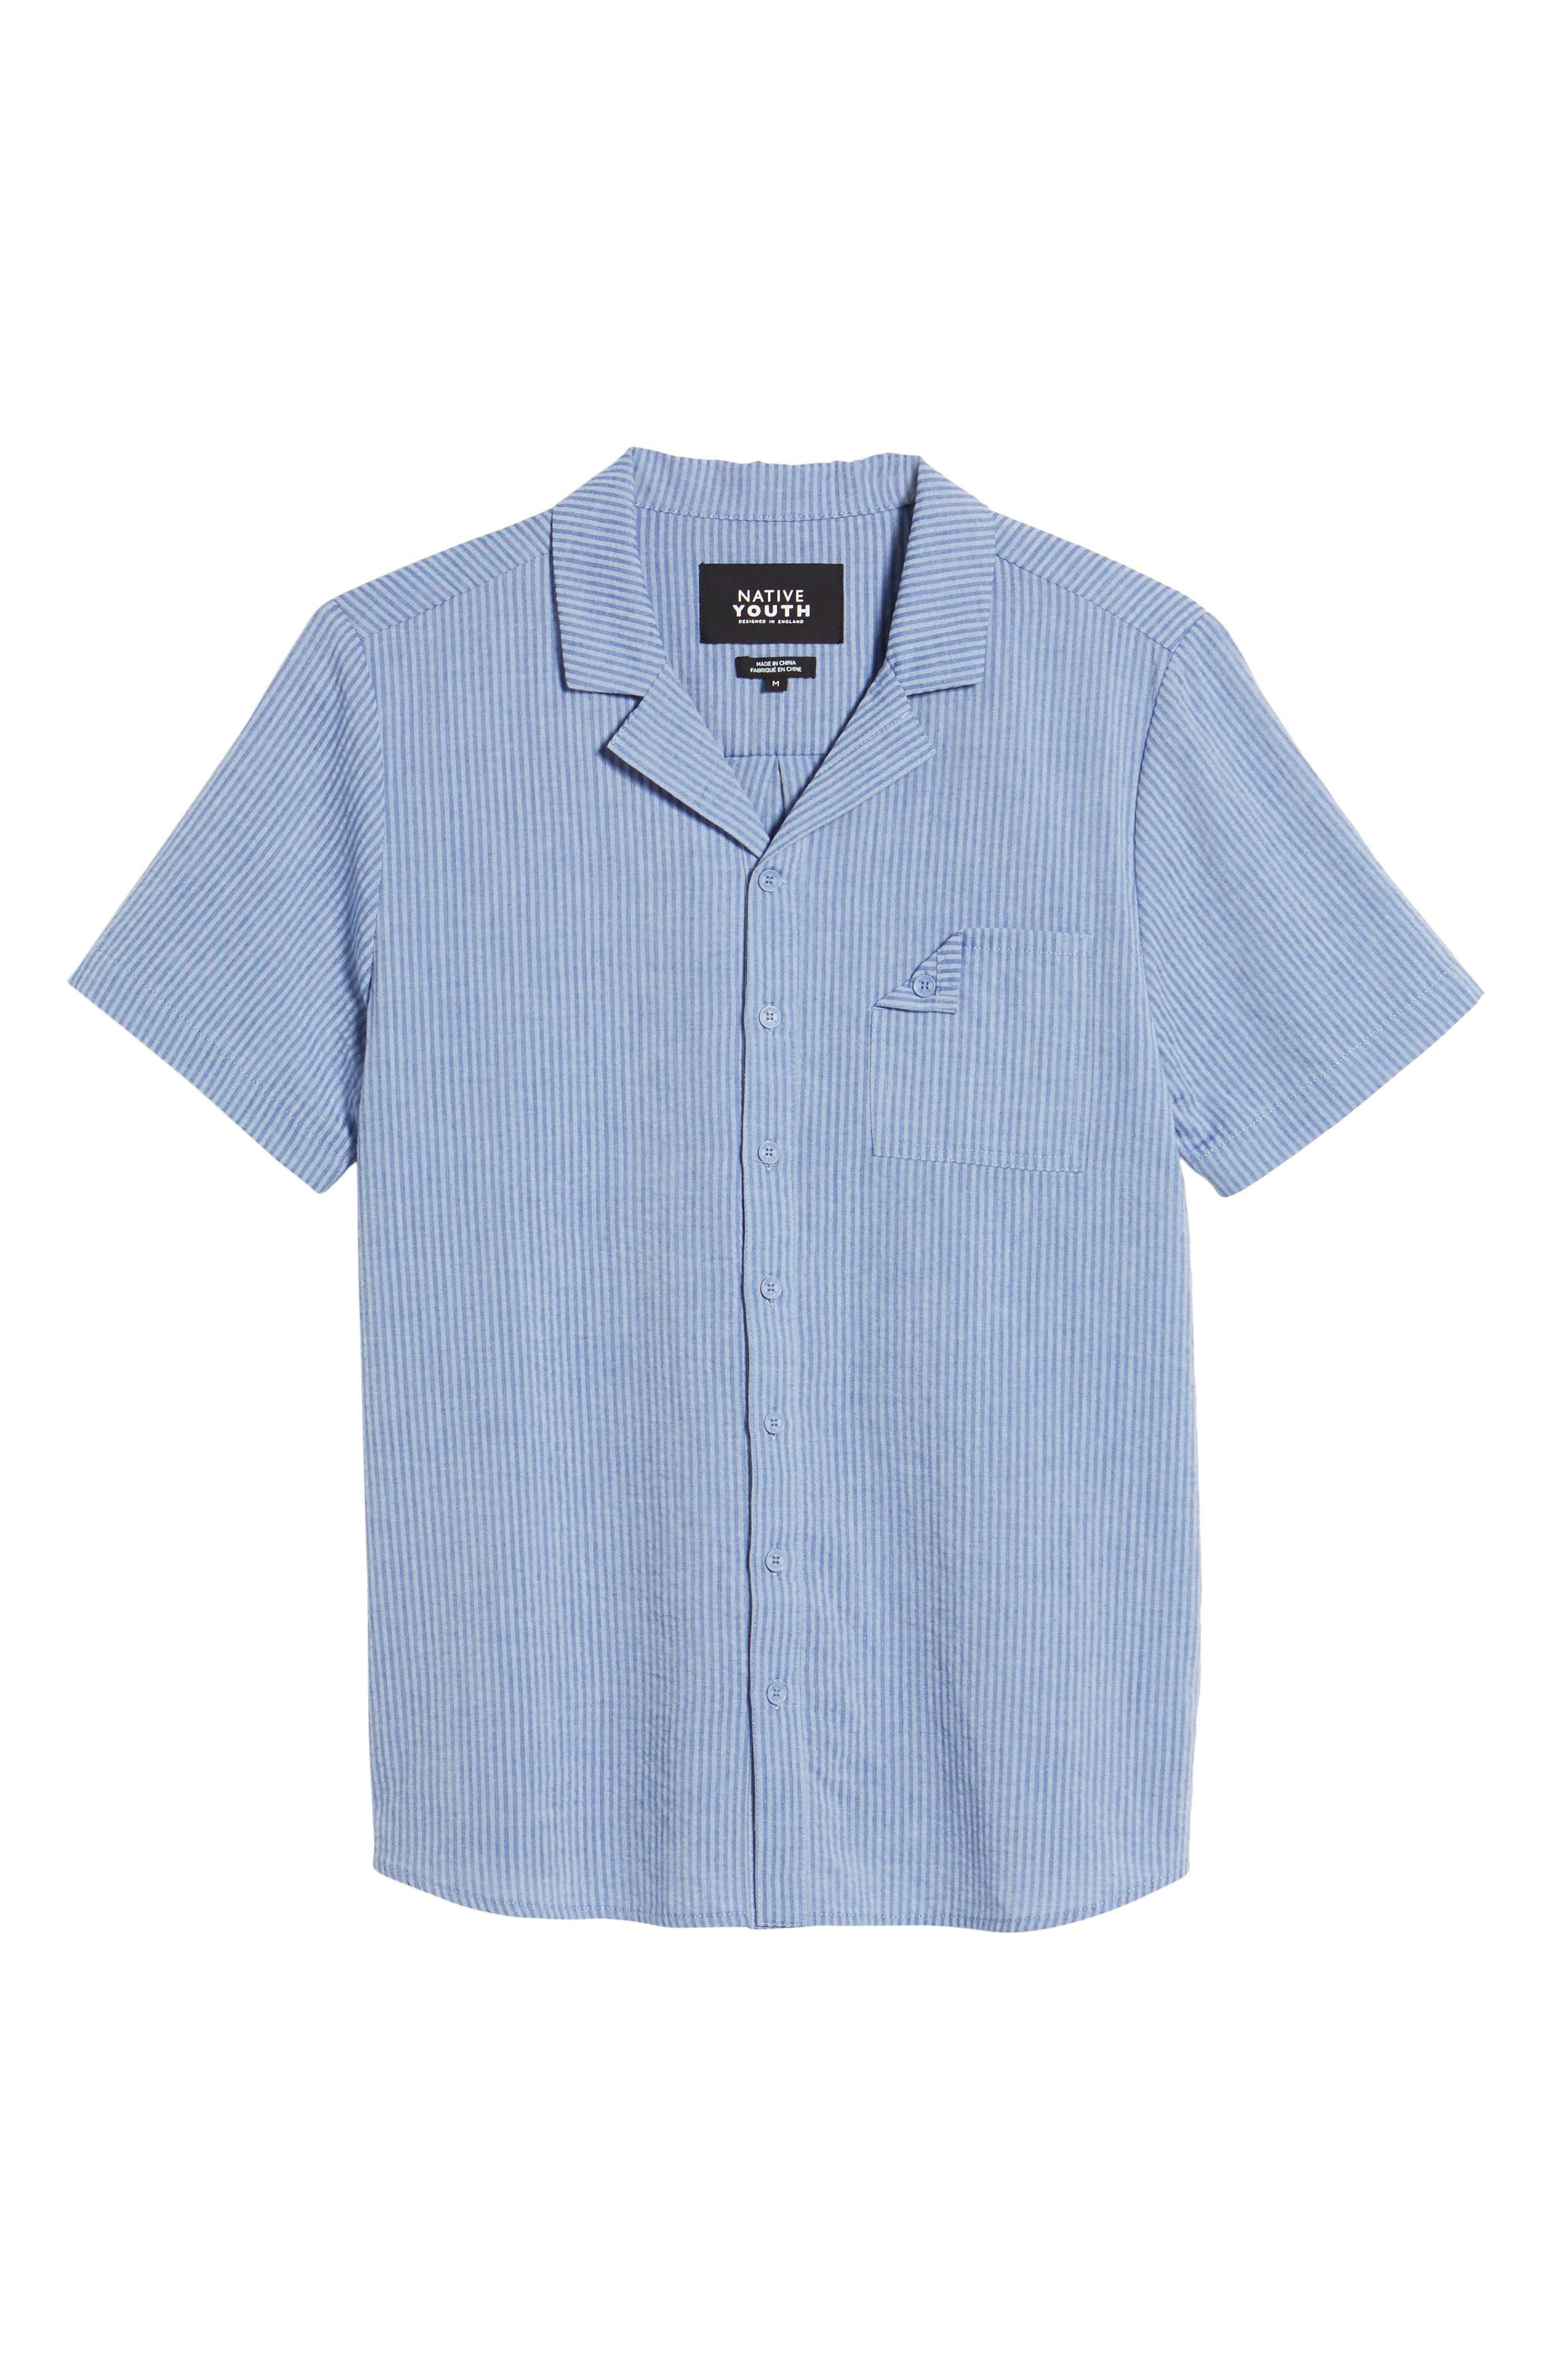 Epiphytes Woven Shirt,                             Alternate thumbnail 6, color,                             Blue